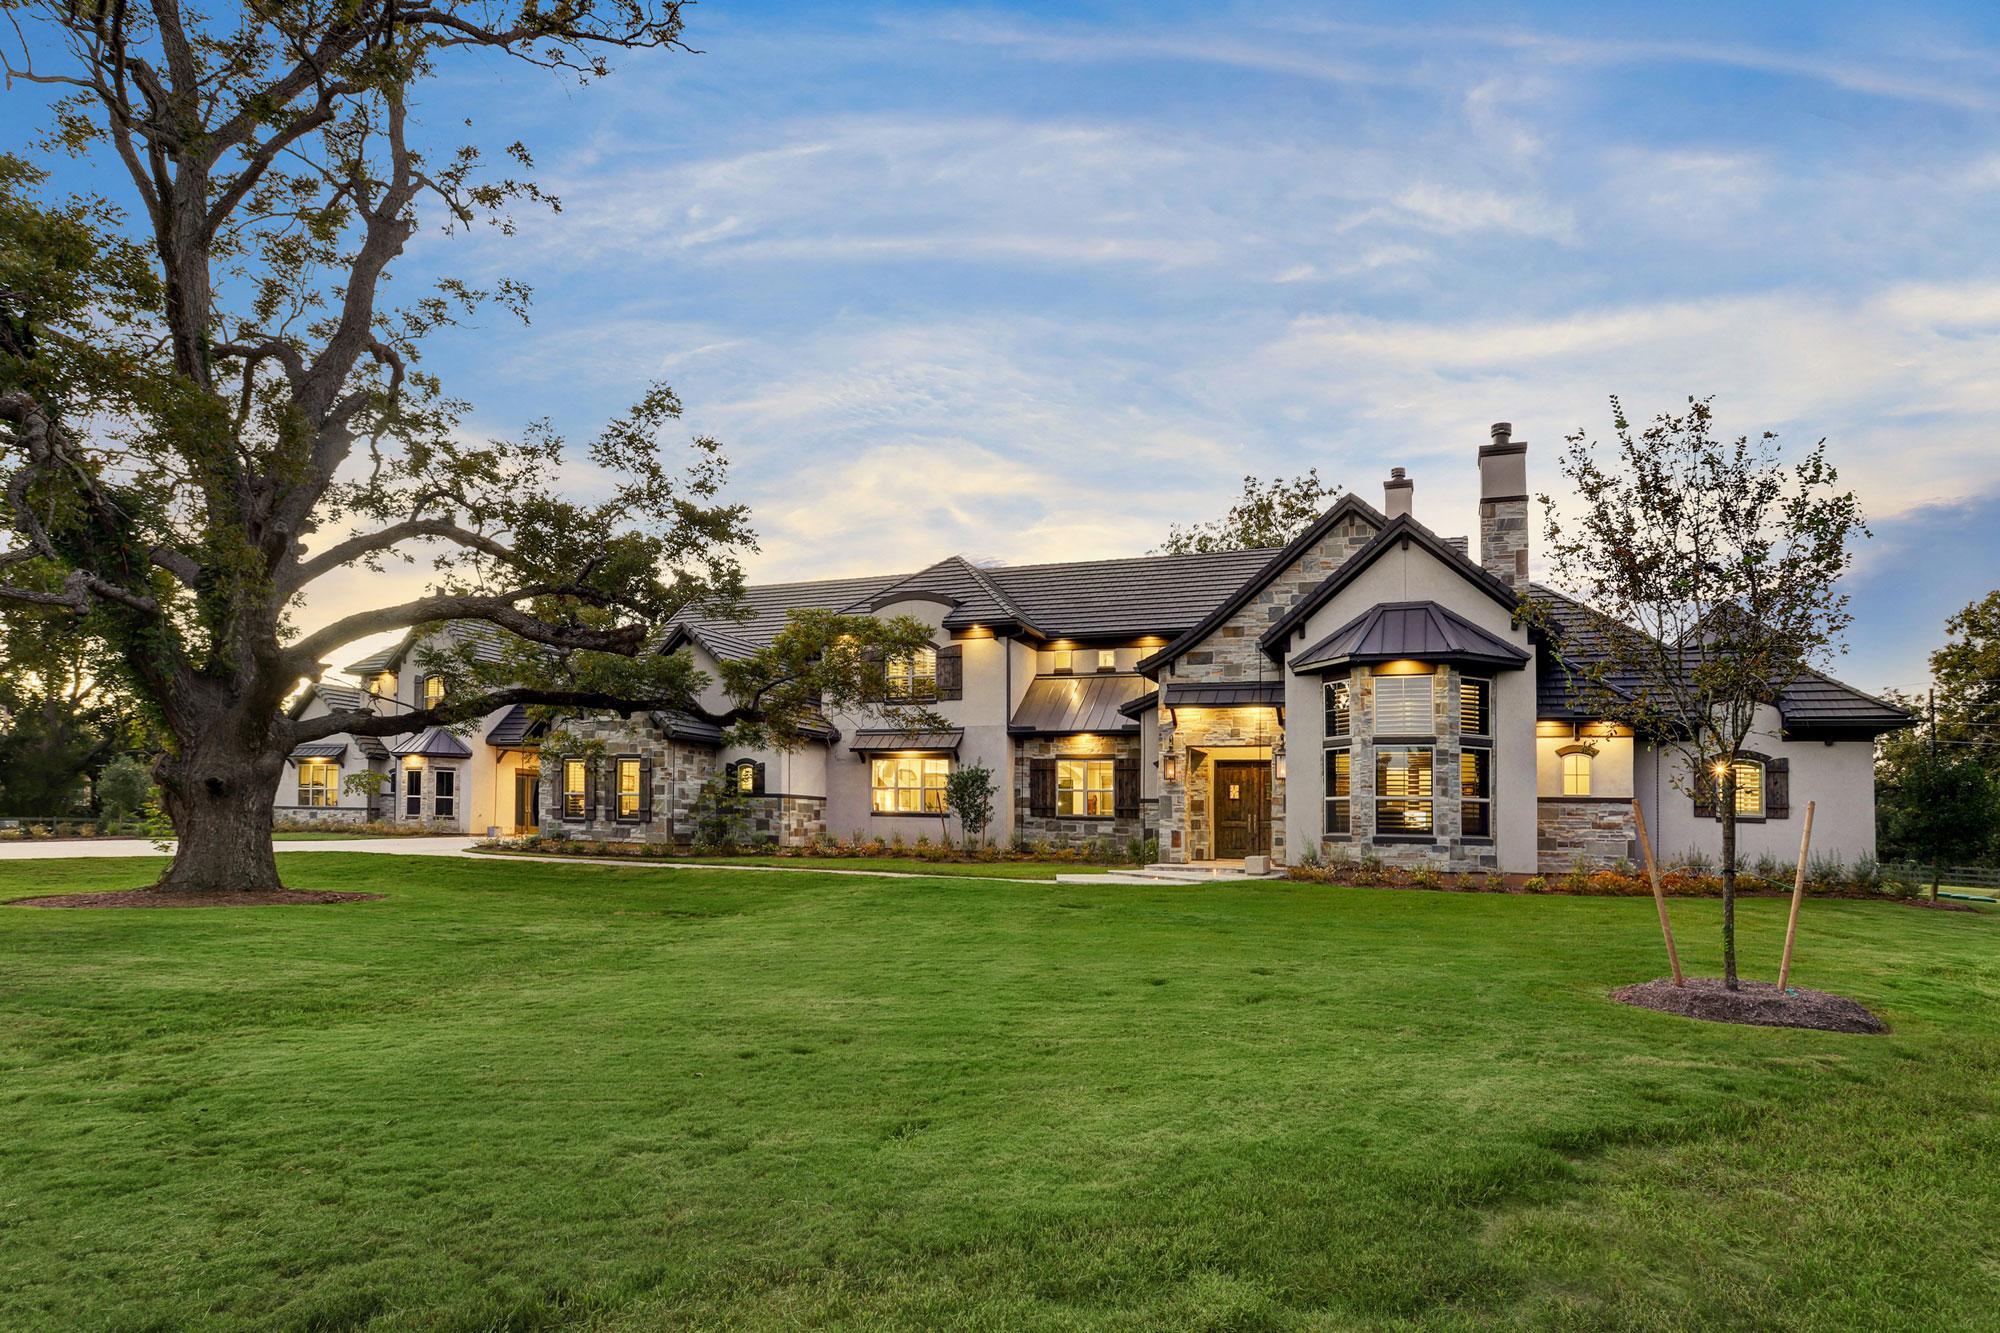 Mike Harrison Custom Homes - Tealpointe Lake Estates